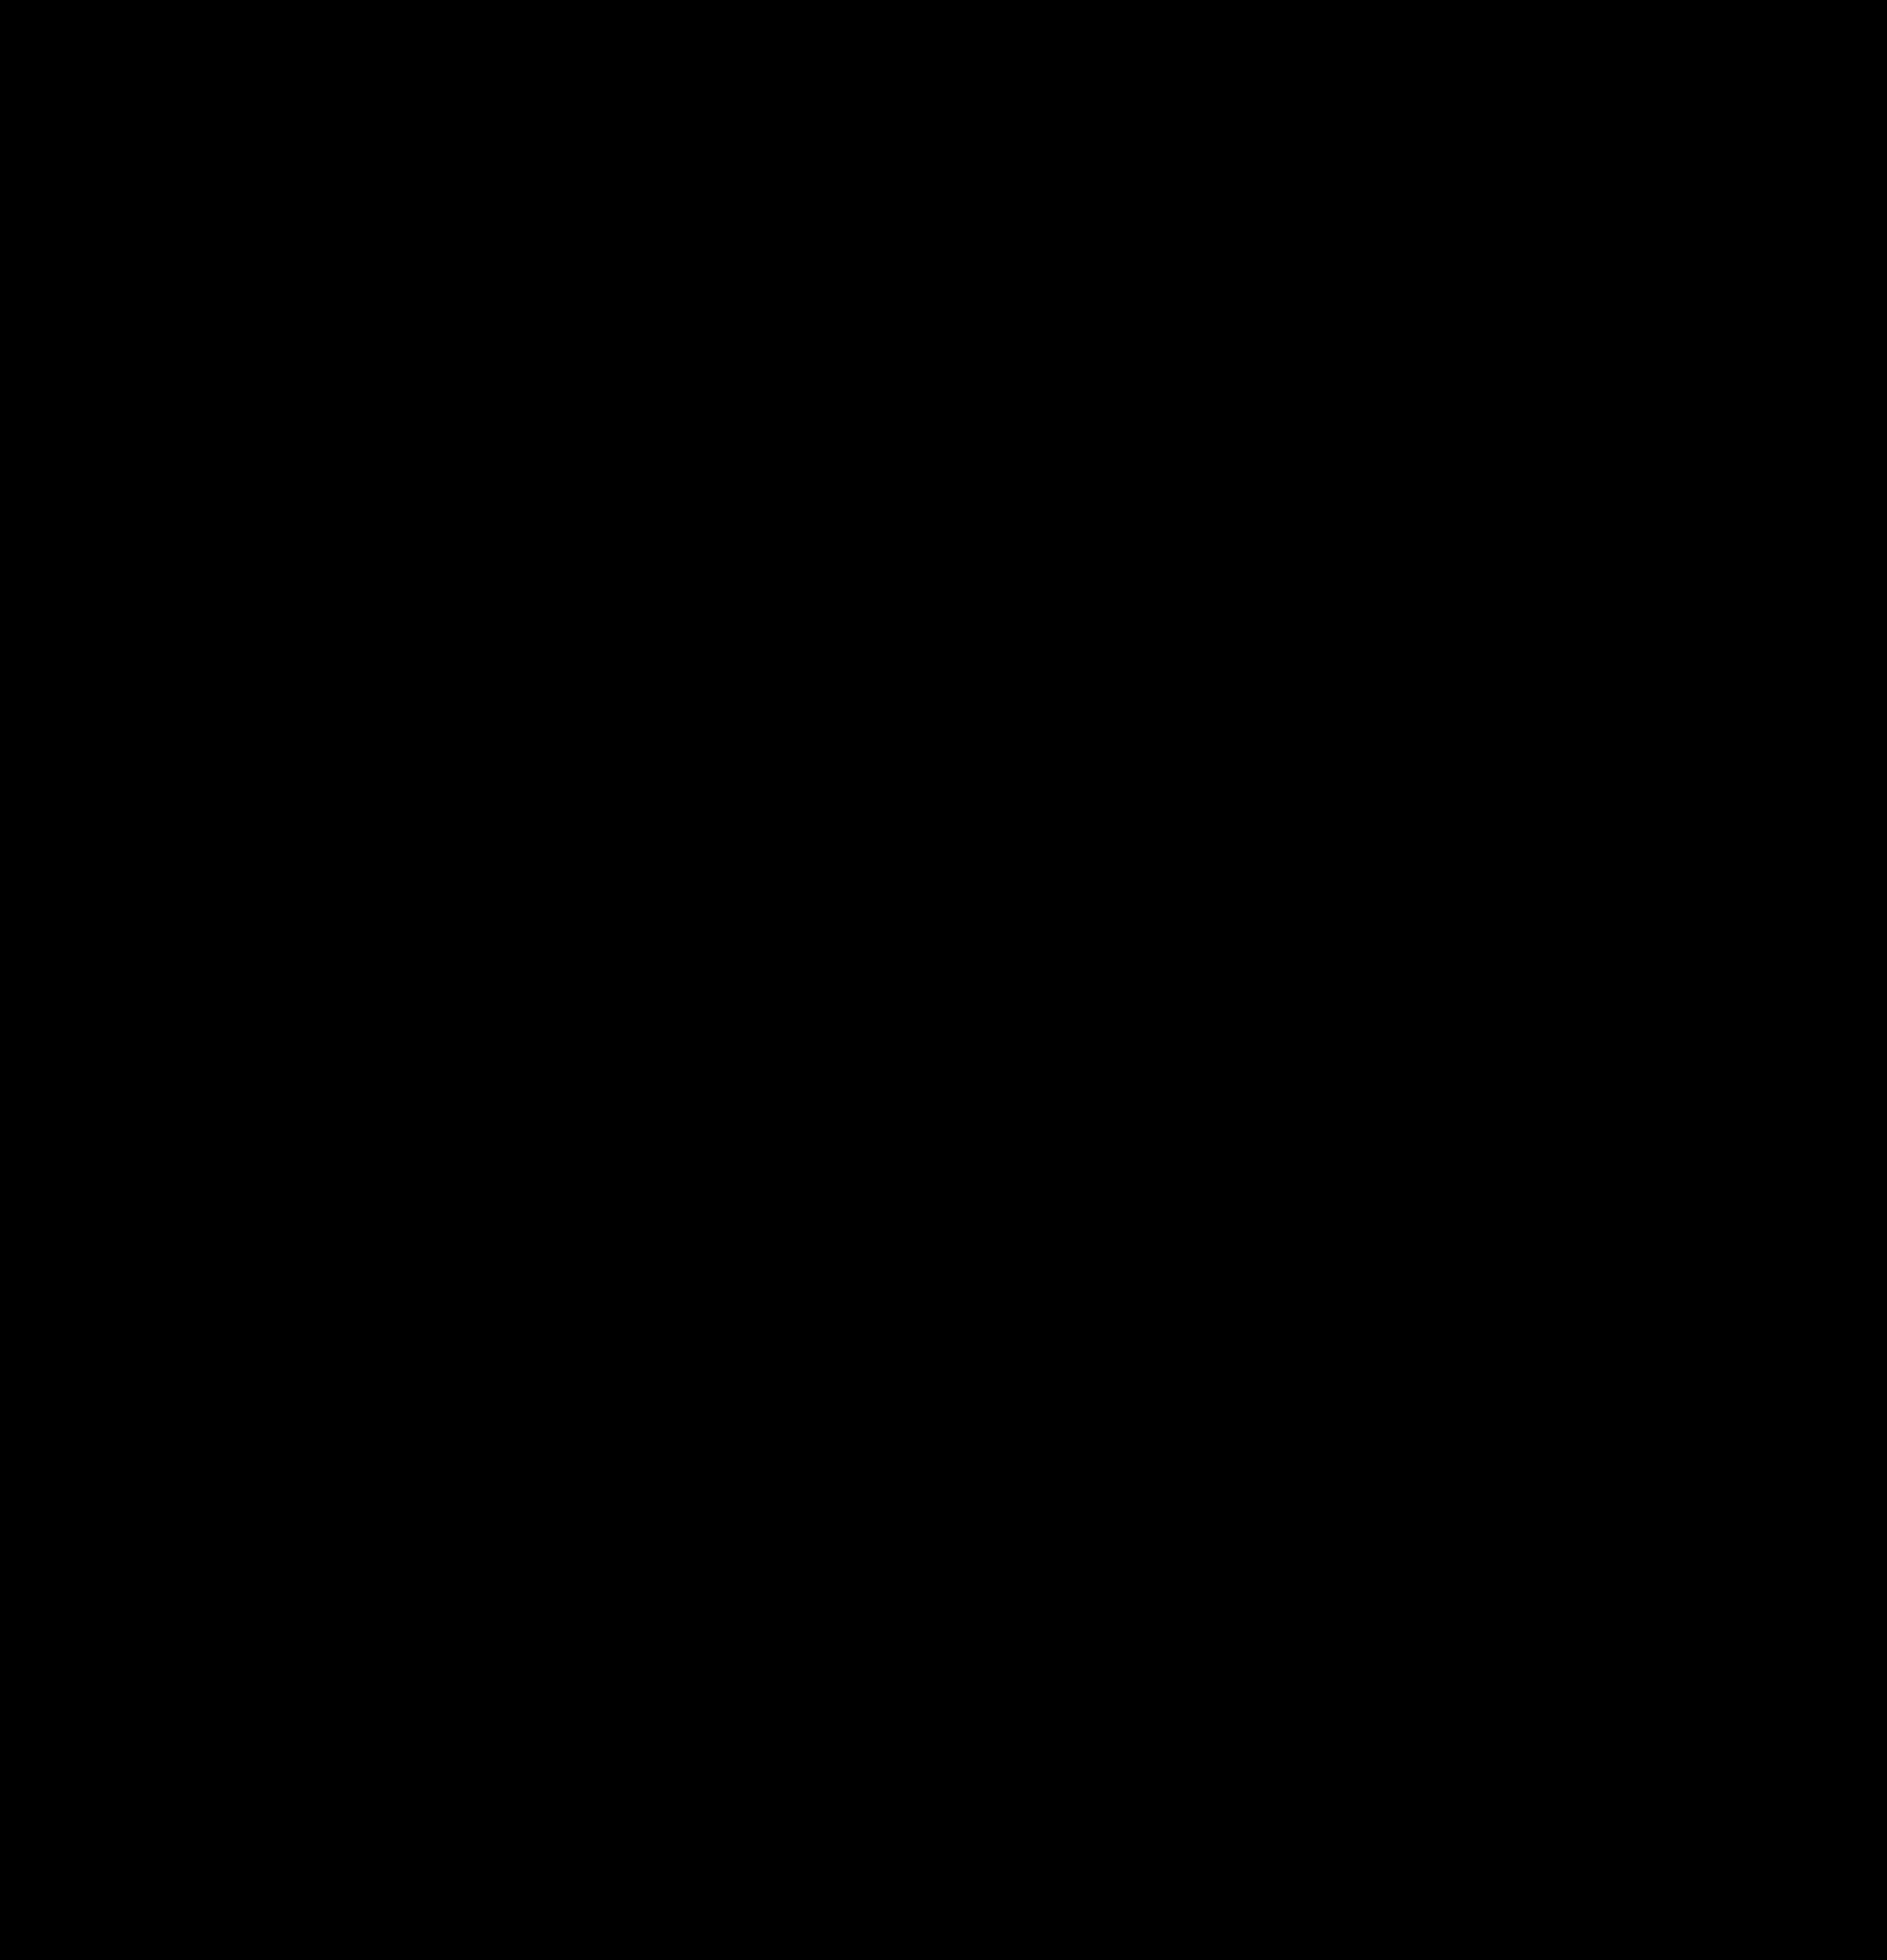 _-logo-black (2).png